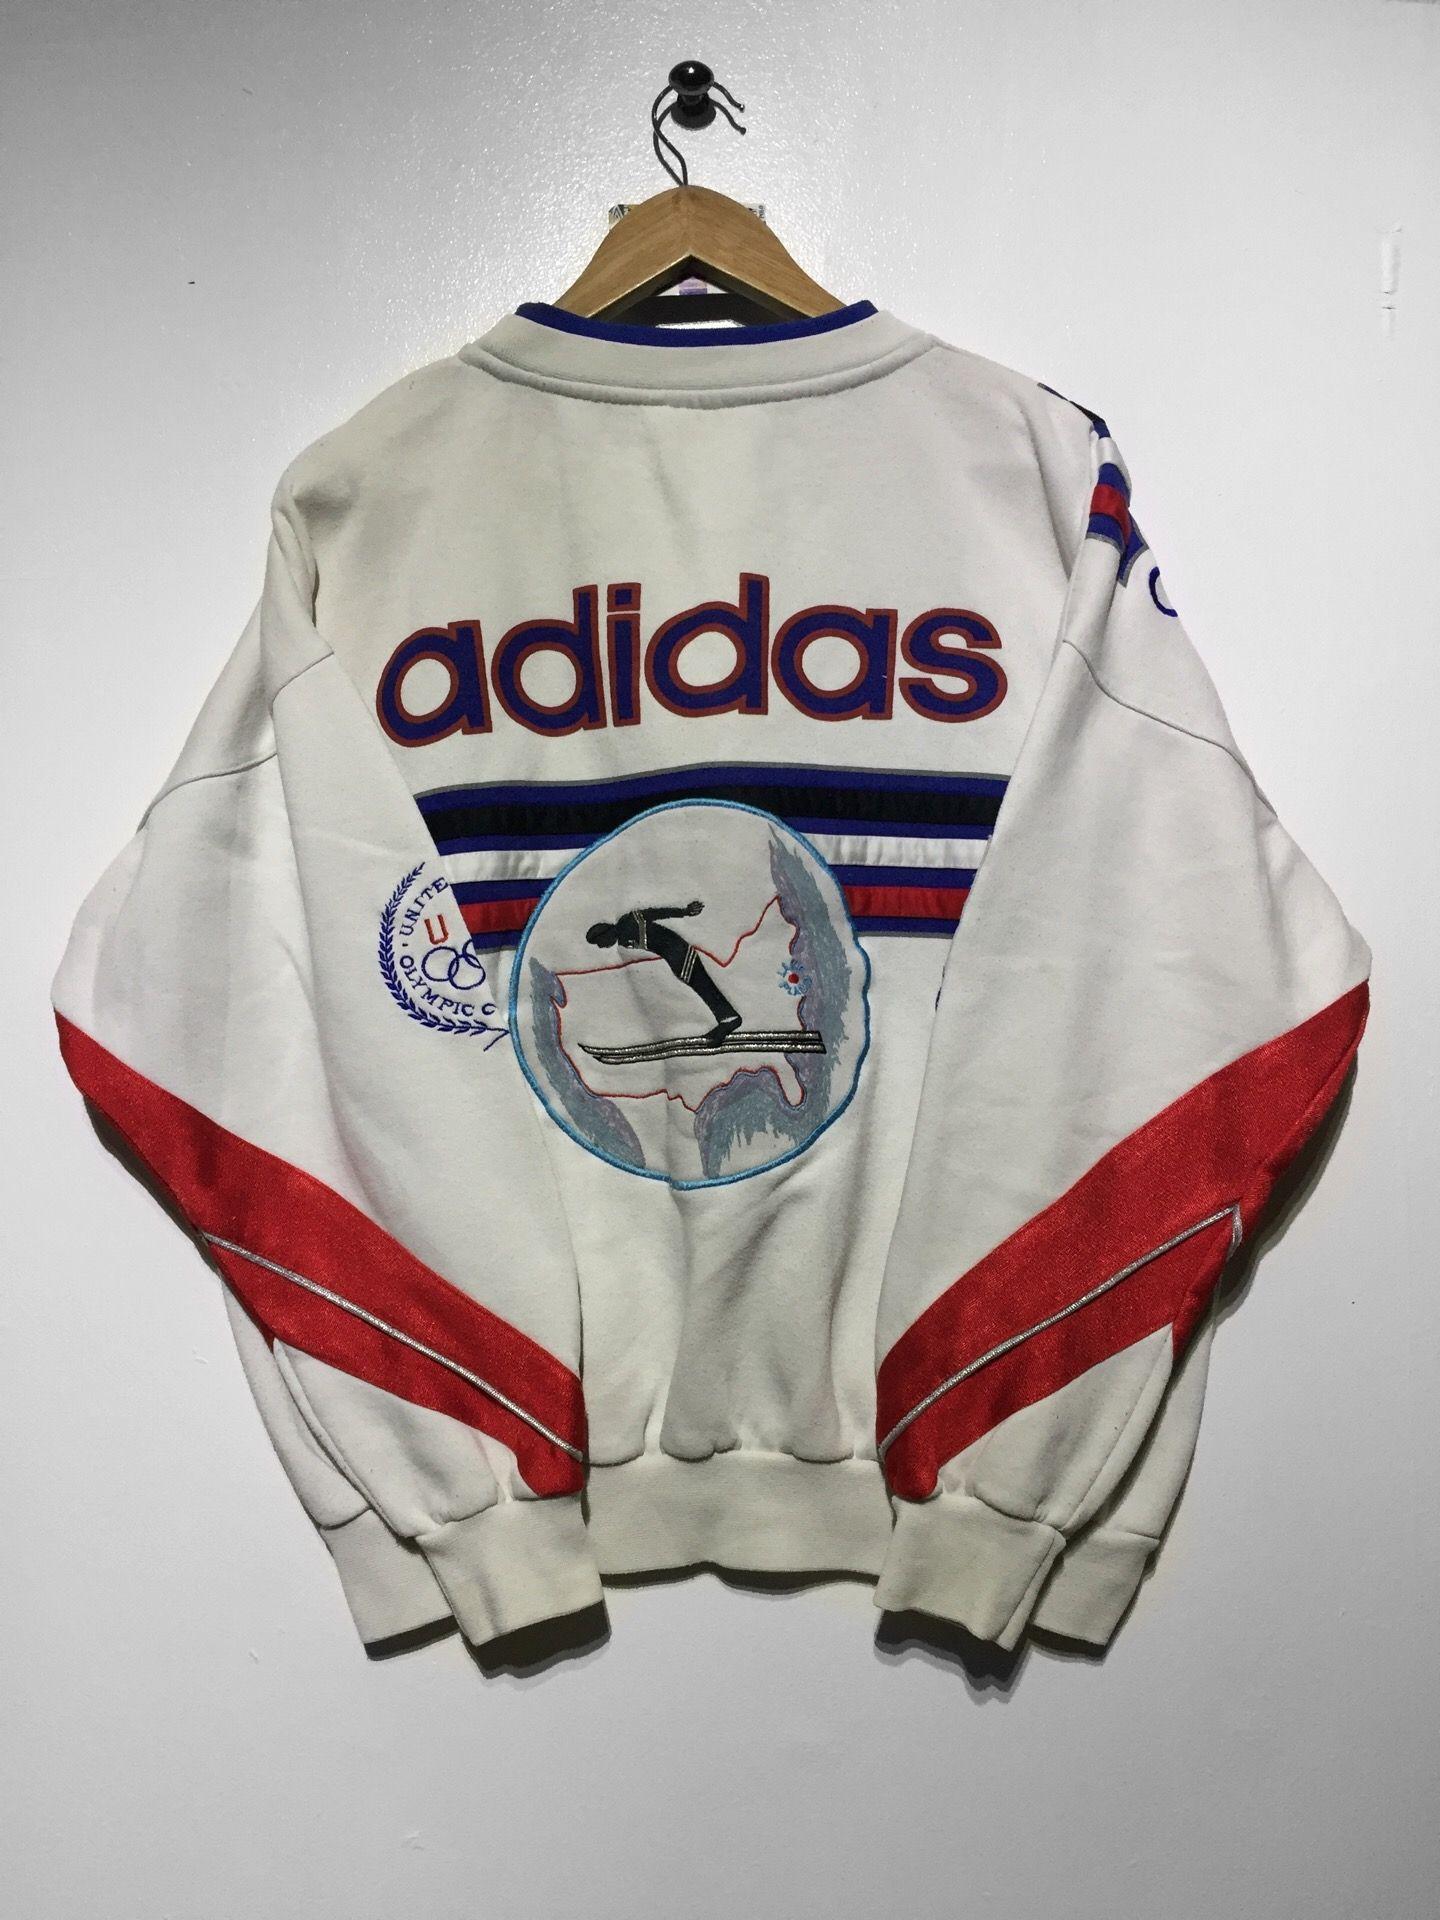 2e802595ca Adidas Winter Olympics sweatshirt size medium £110 Website➡ www.retroreflex. uk  addias  vintage  oldschool  sweatshirt